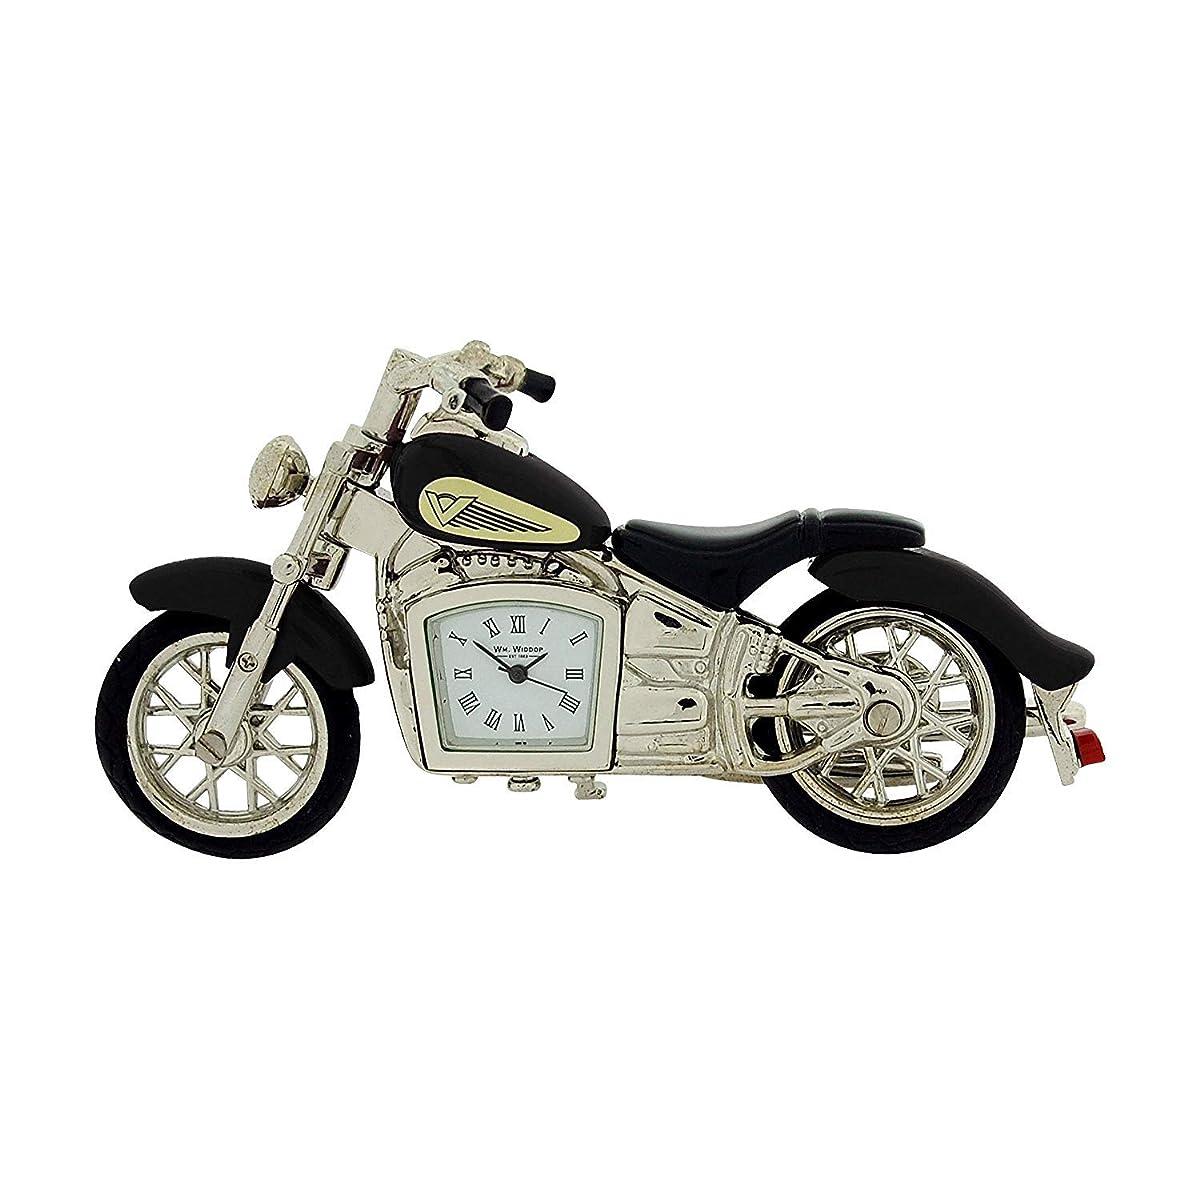 Miniature Black Indian Style Motorbike Novelty Collectors Clock - 9497B